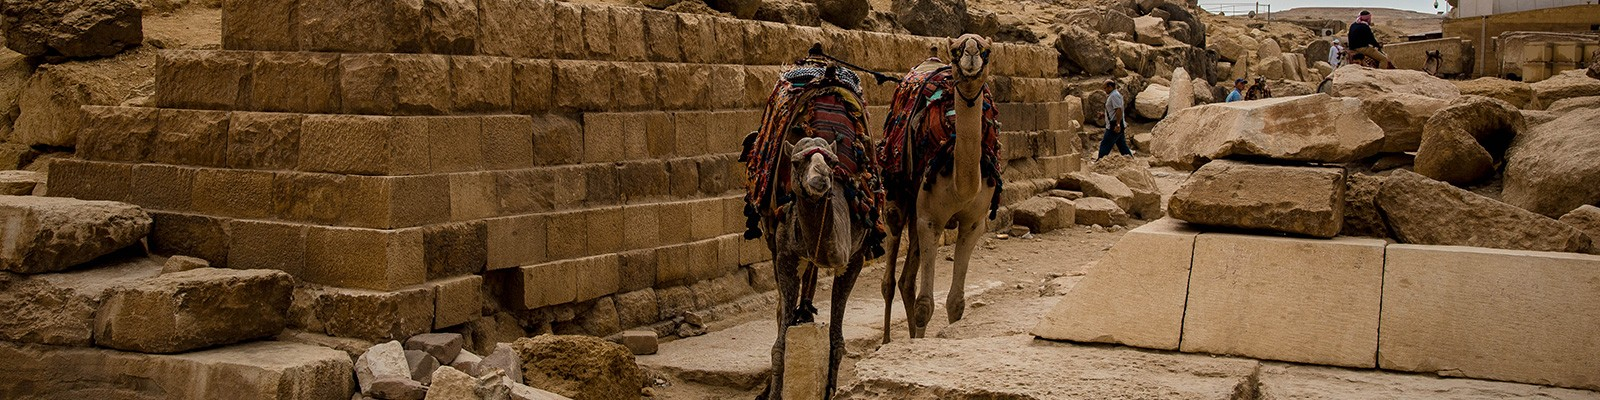 Istorija Kaira